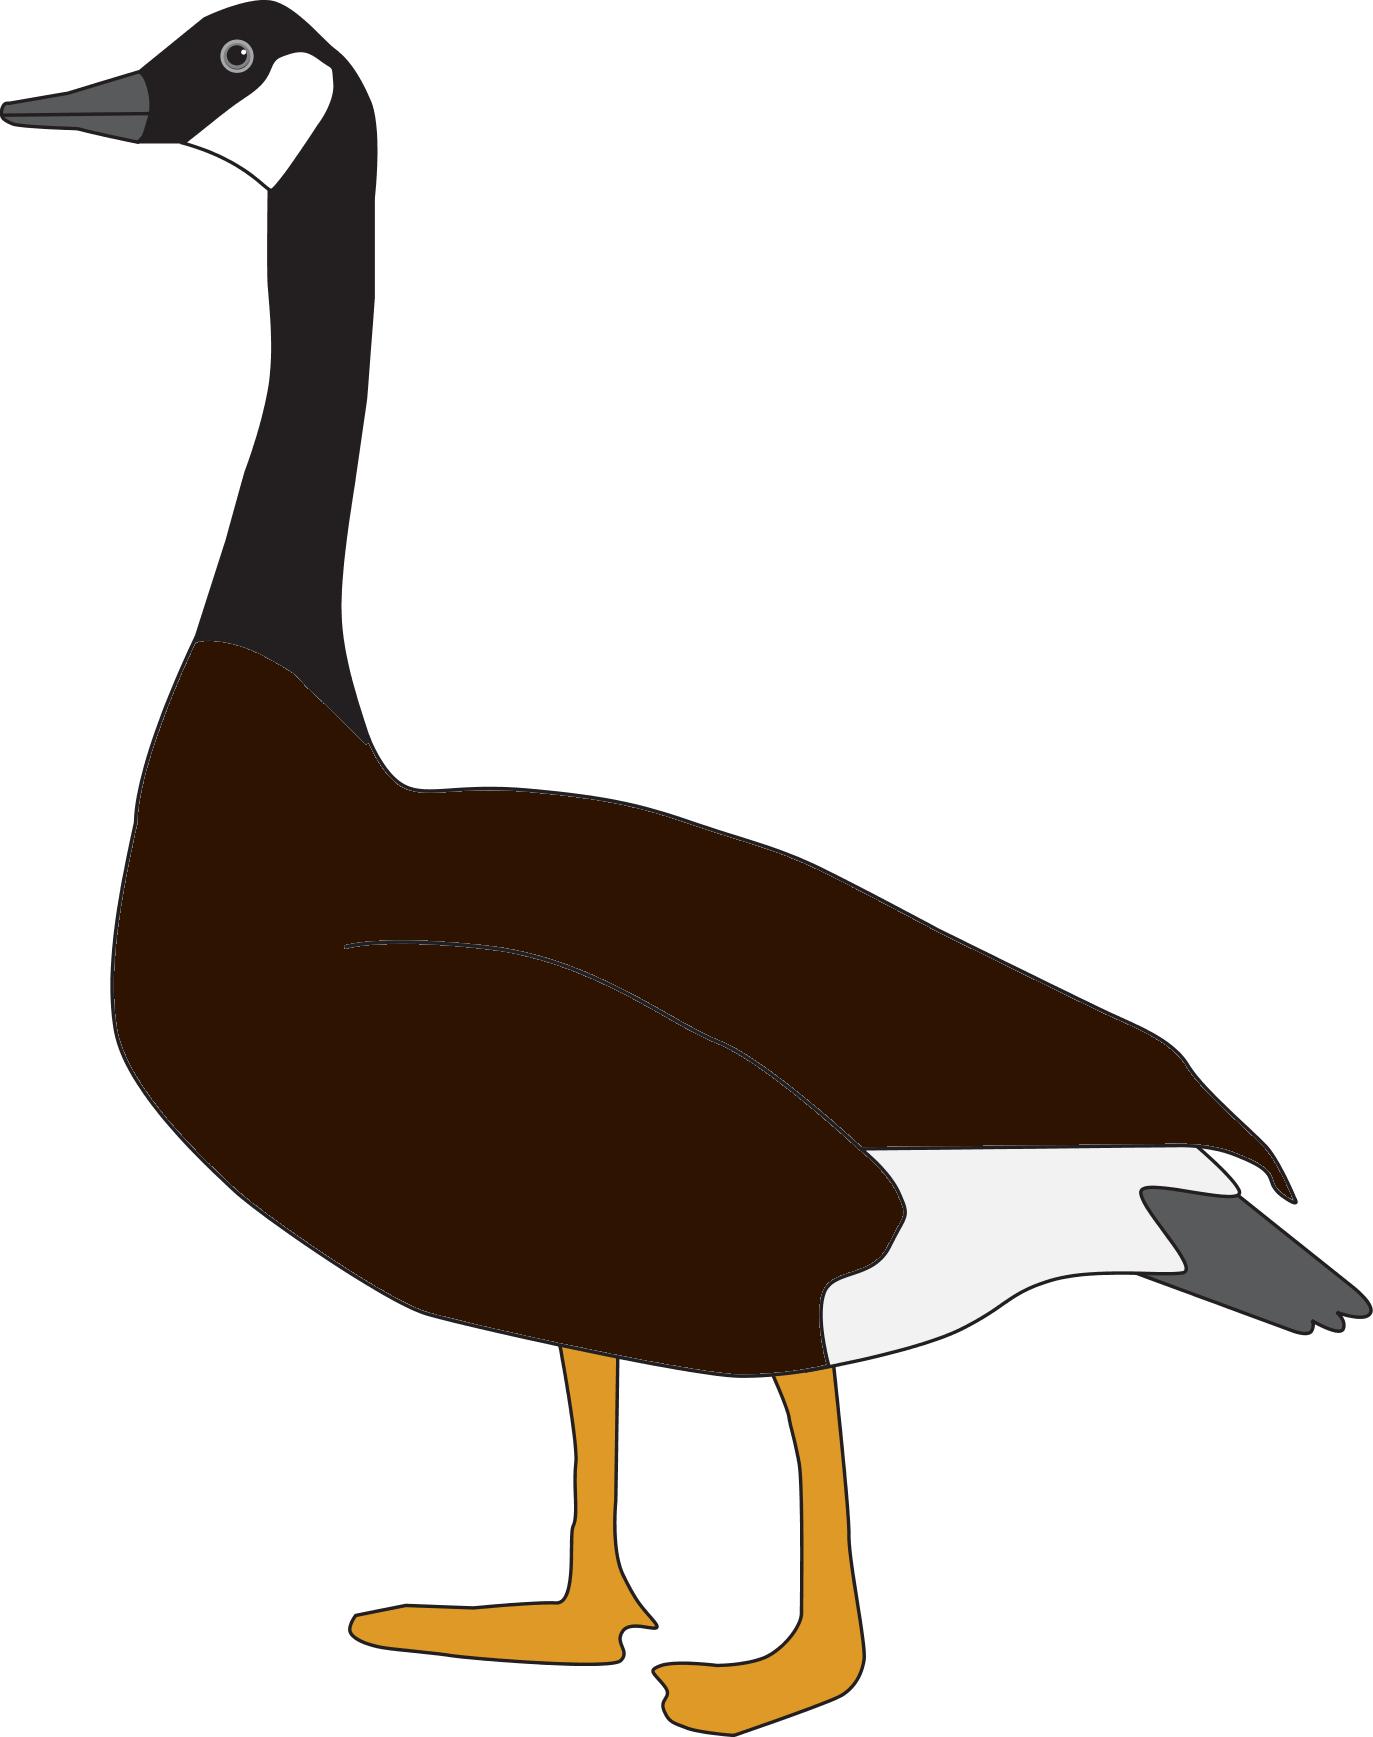 Goose.png - Goose, Transparent background PNG HD thumbnail